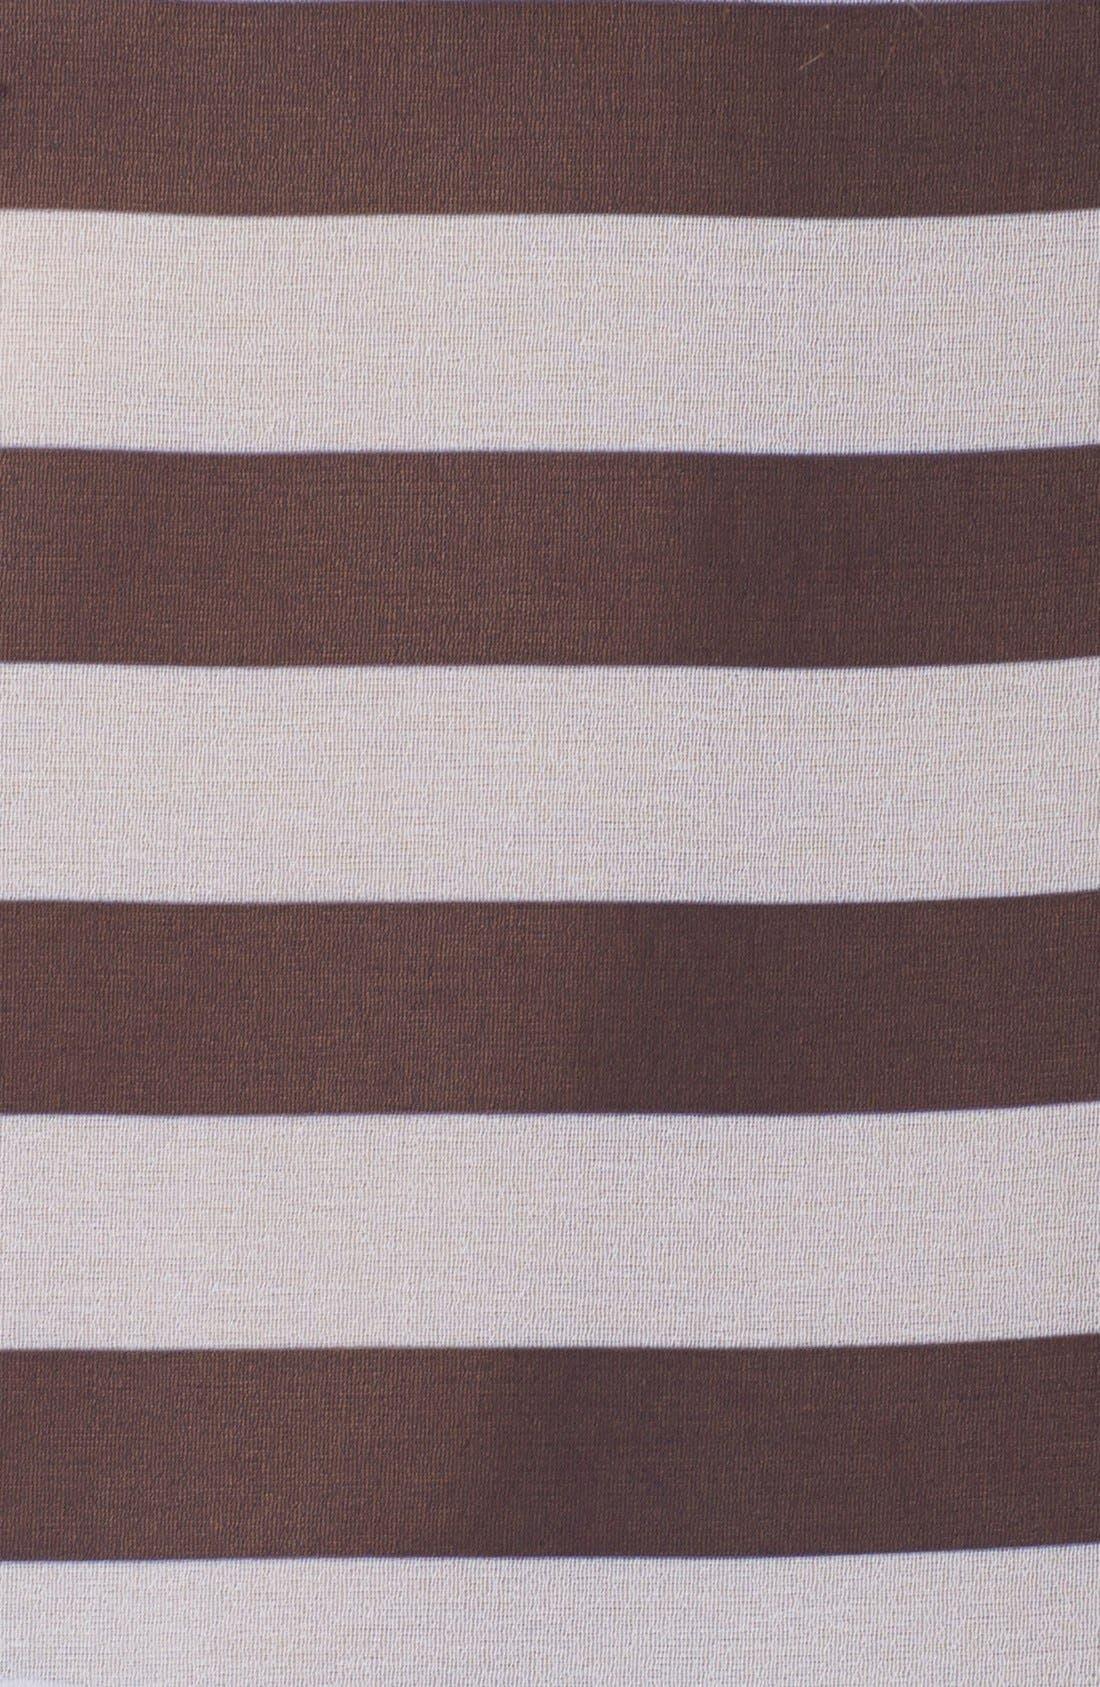 Alternate Image 3  - Ted Baker London Stripe Cover-Up Tunic